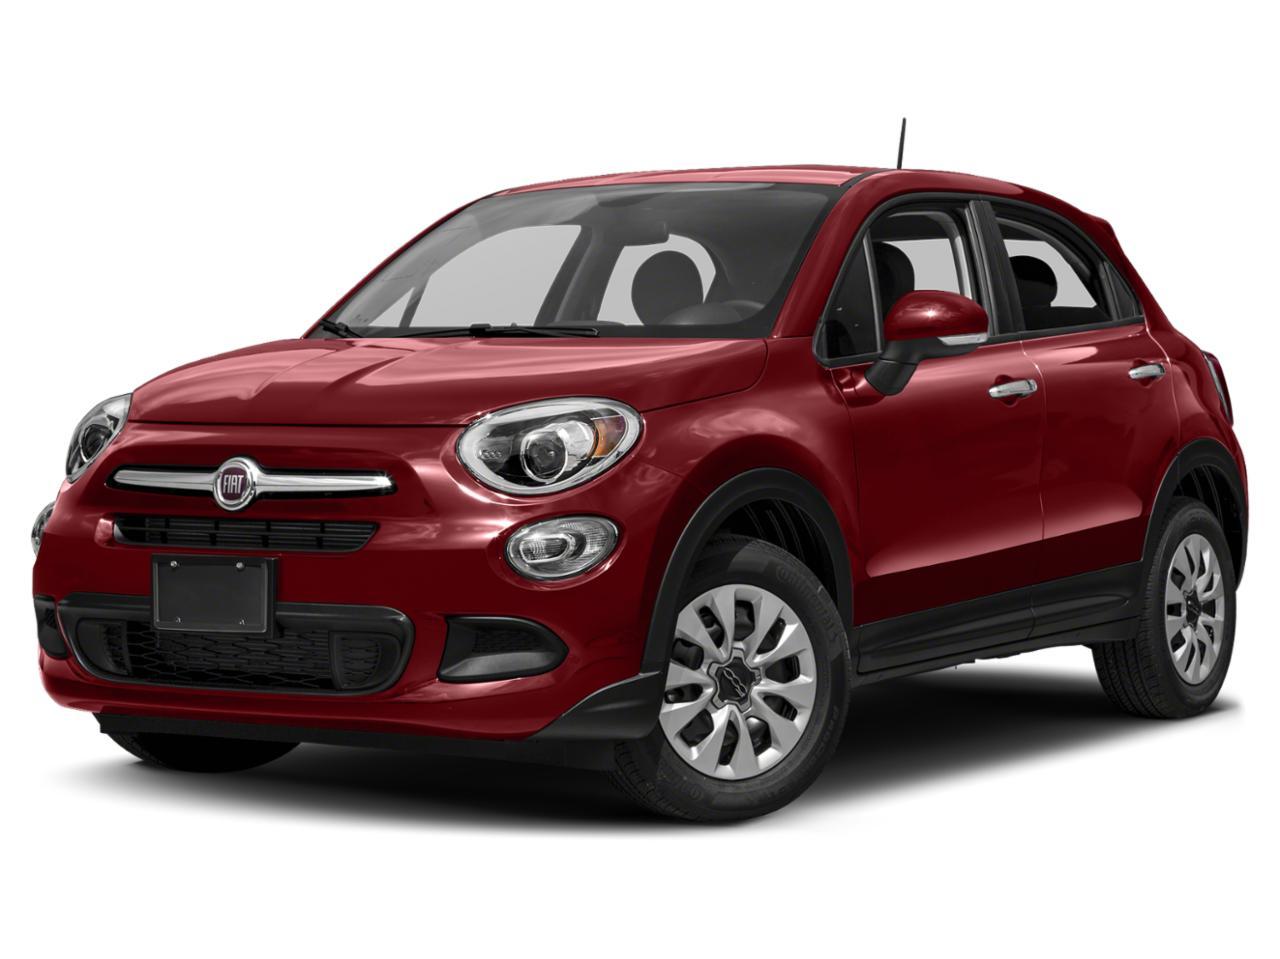 used 2017 fiat vehicles for sale in tampa fl ed morse mitsubishi ed morse mitsubishi